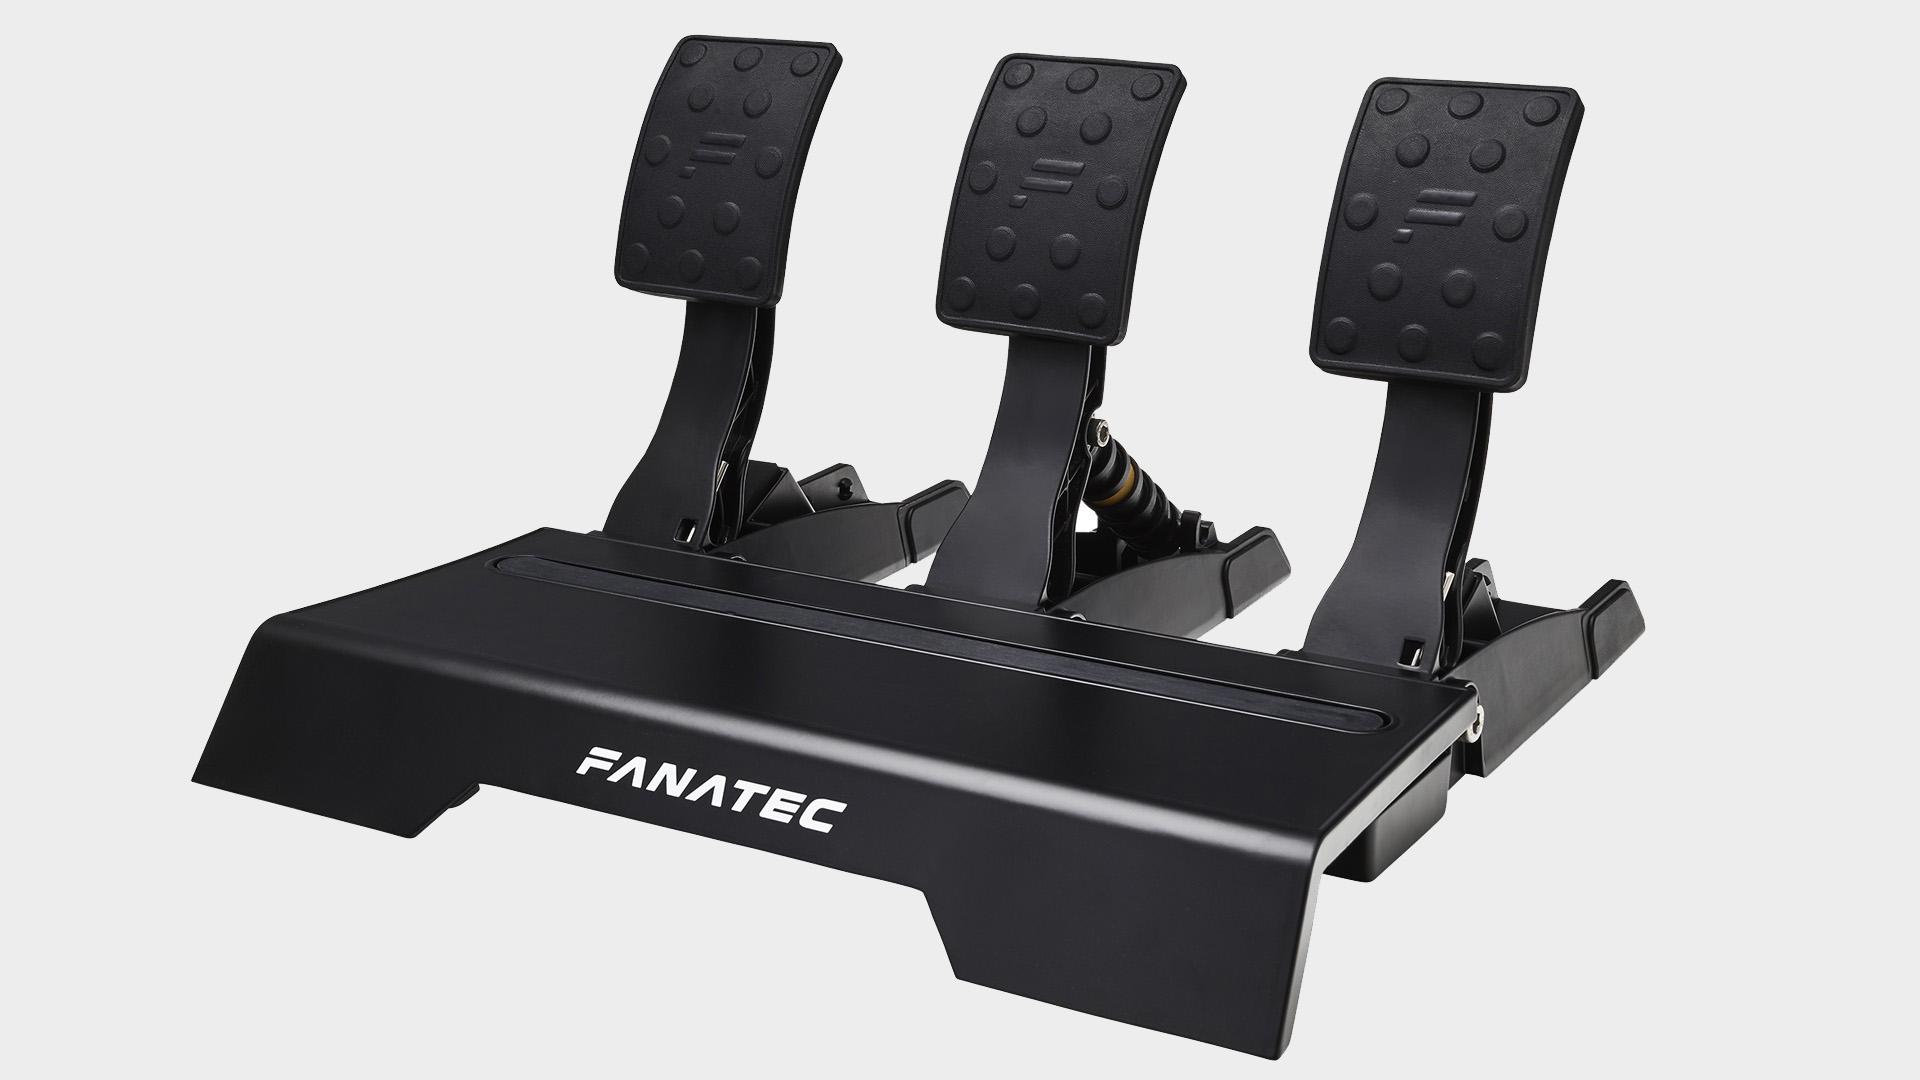 Fanatec CSL Elite racing wheel components